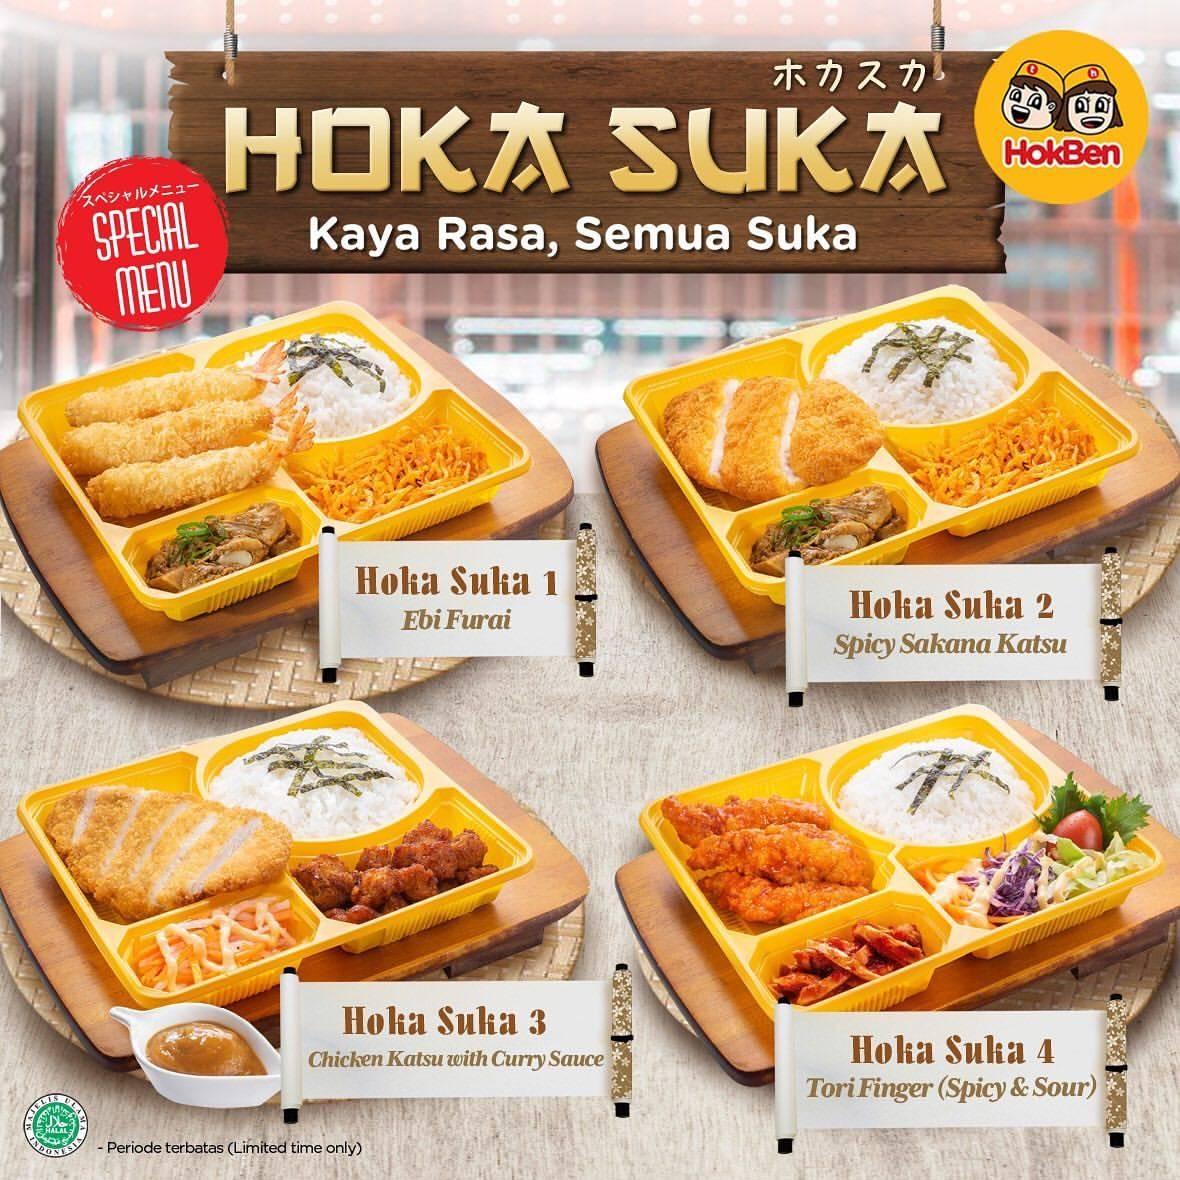 HOKBEN Promo HOKA SUKA TASTE of ASIA, Harga mulai Rp.52.000